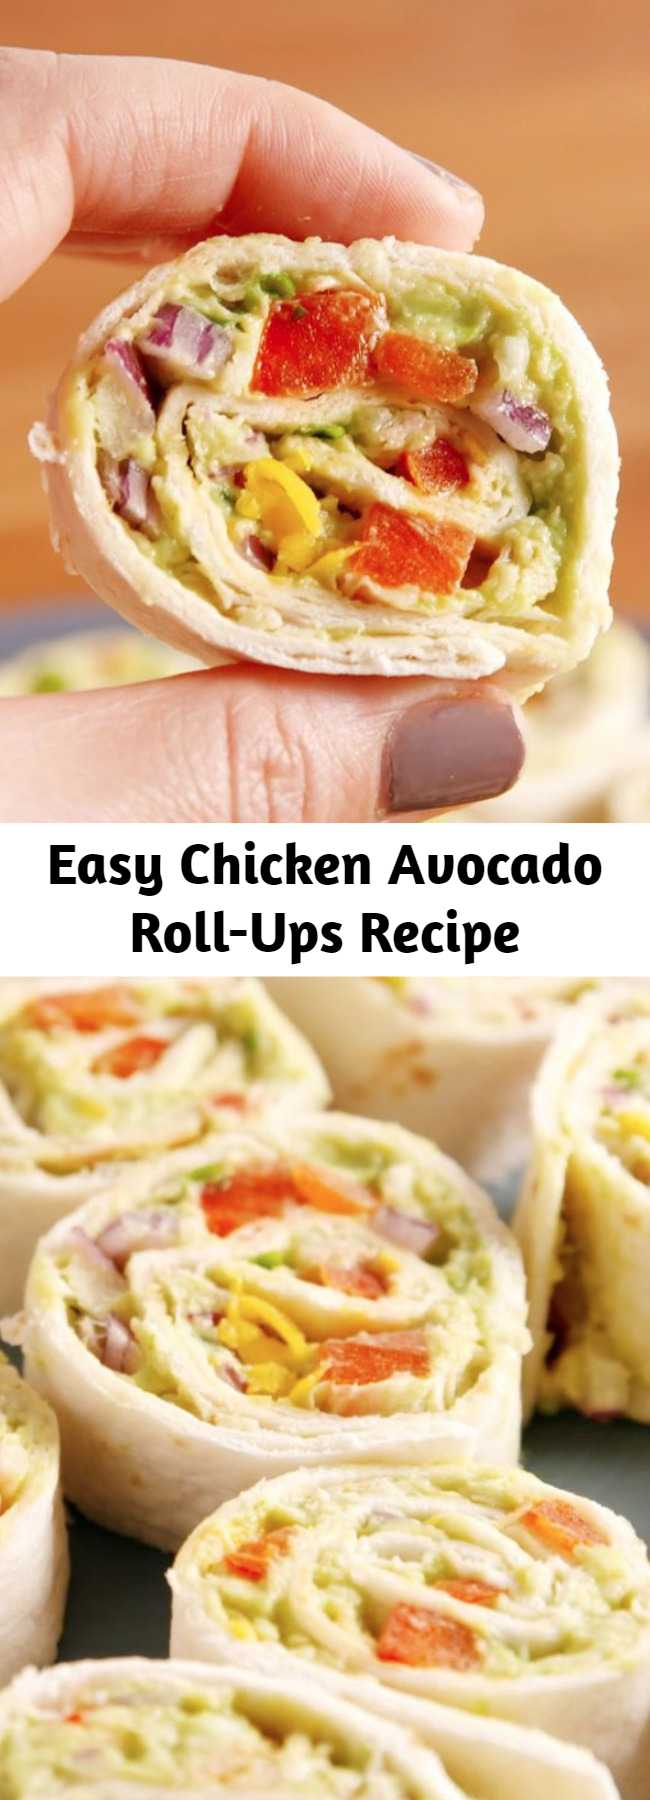 Easy Chicken Avocado Roll-Ups Recipe - These easy chicken avocado salad pinwheels are way more fun than a regular sandwich. These chicken avocado salad pinwheels double as a nutritious lunch and an adorable party appetizer.